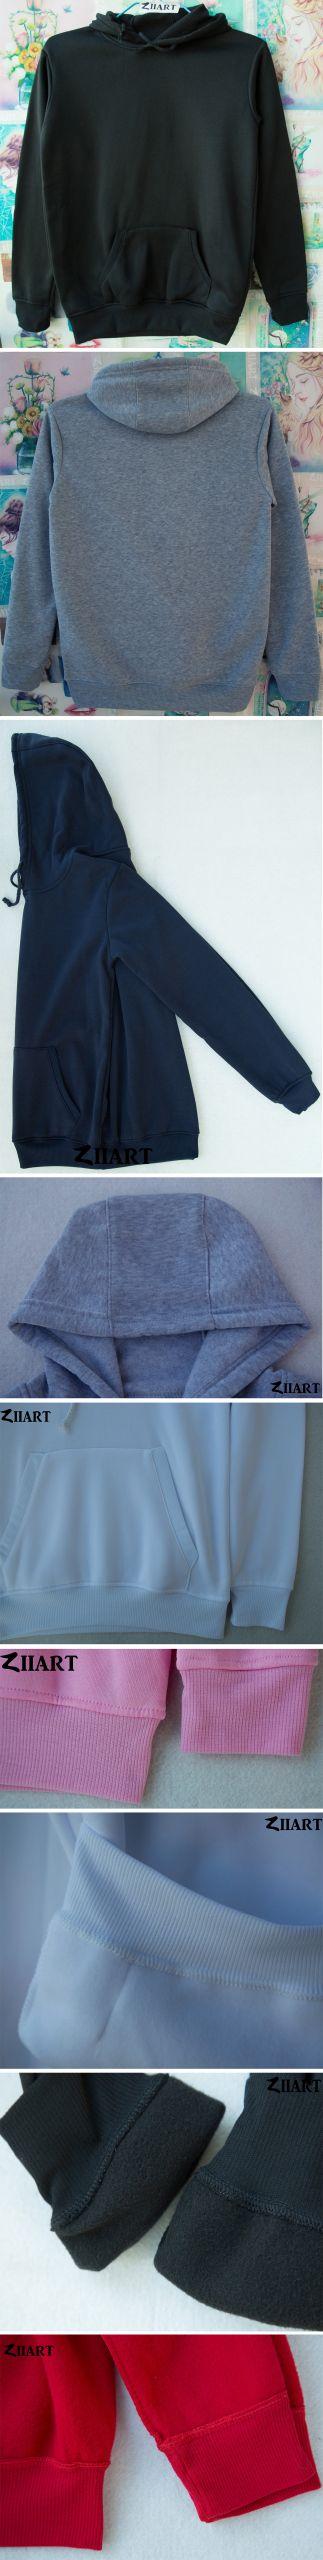 Walking Dead Zombie Bloody Hand Man Boys Hoodie Couple Clothes Autumn Winter Fleece ZIIART 5 scaled